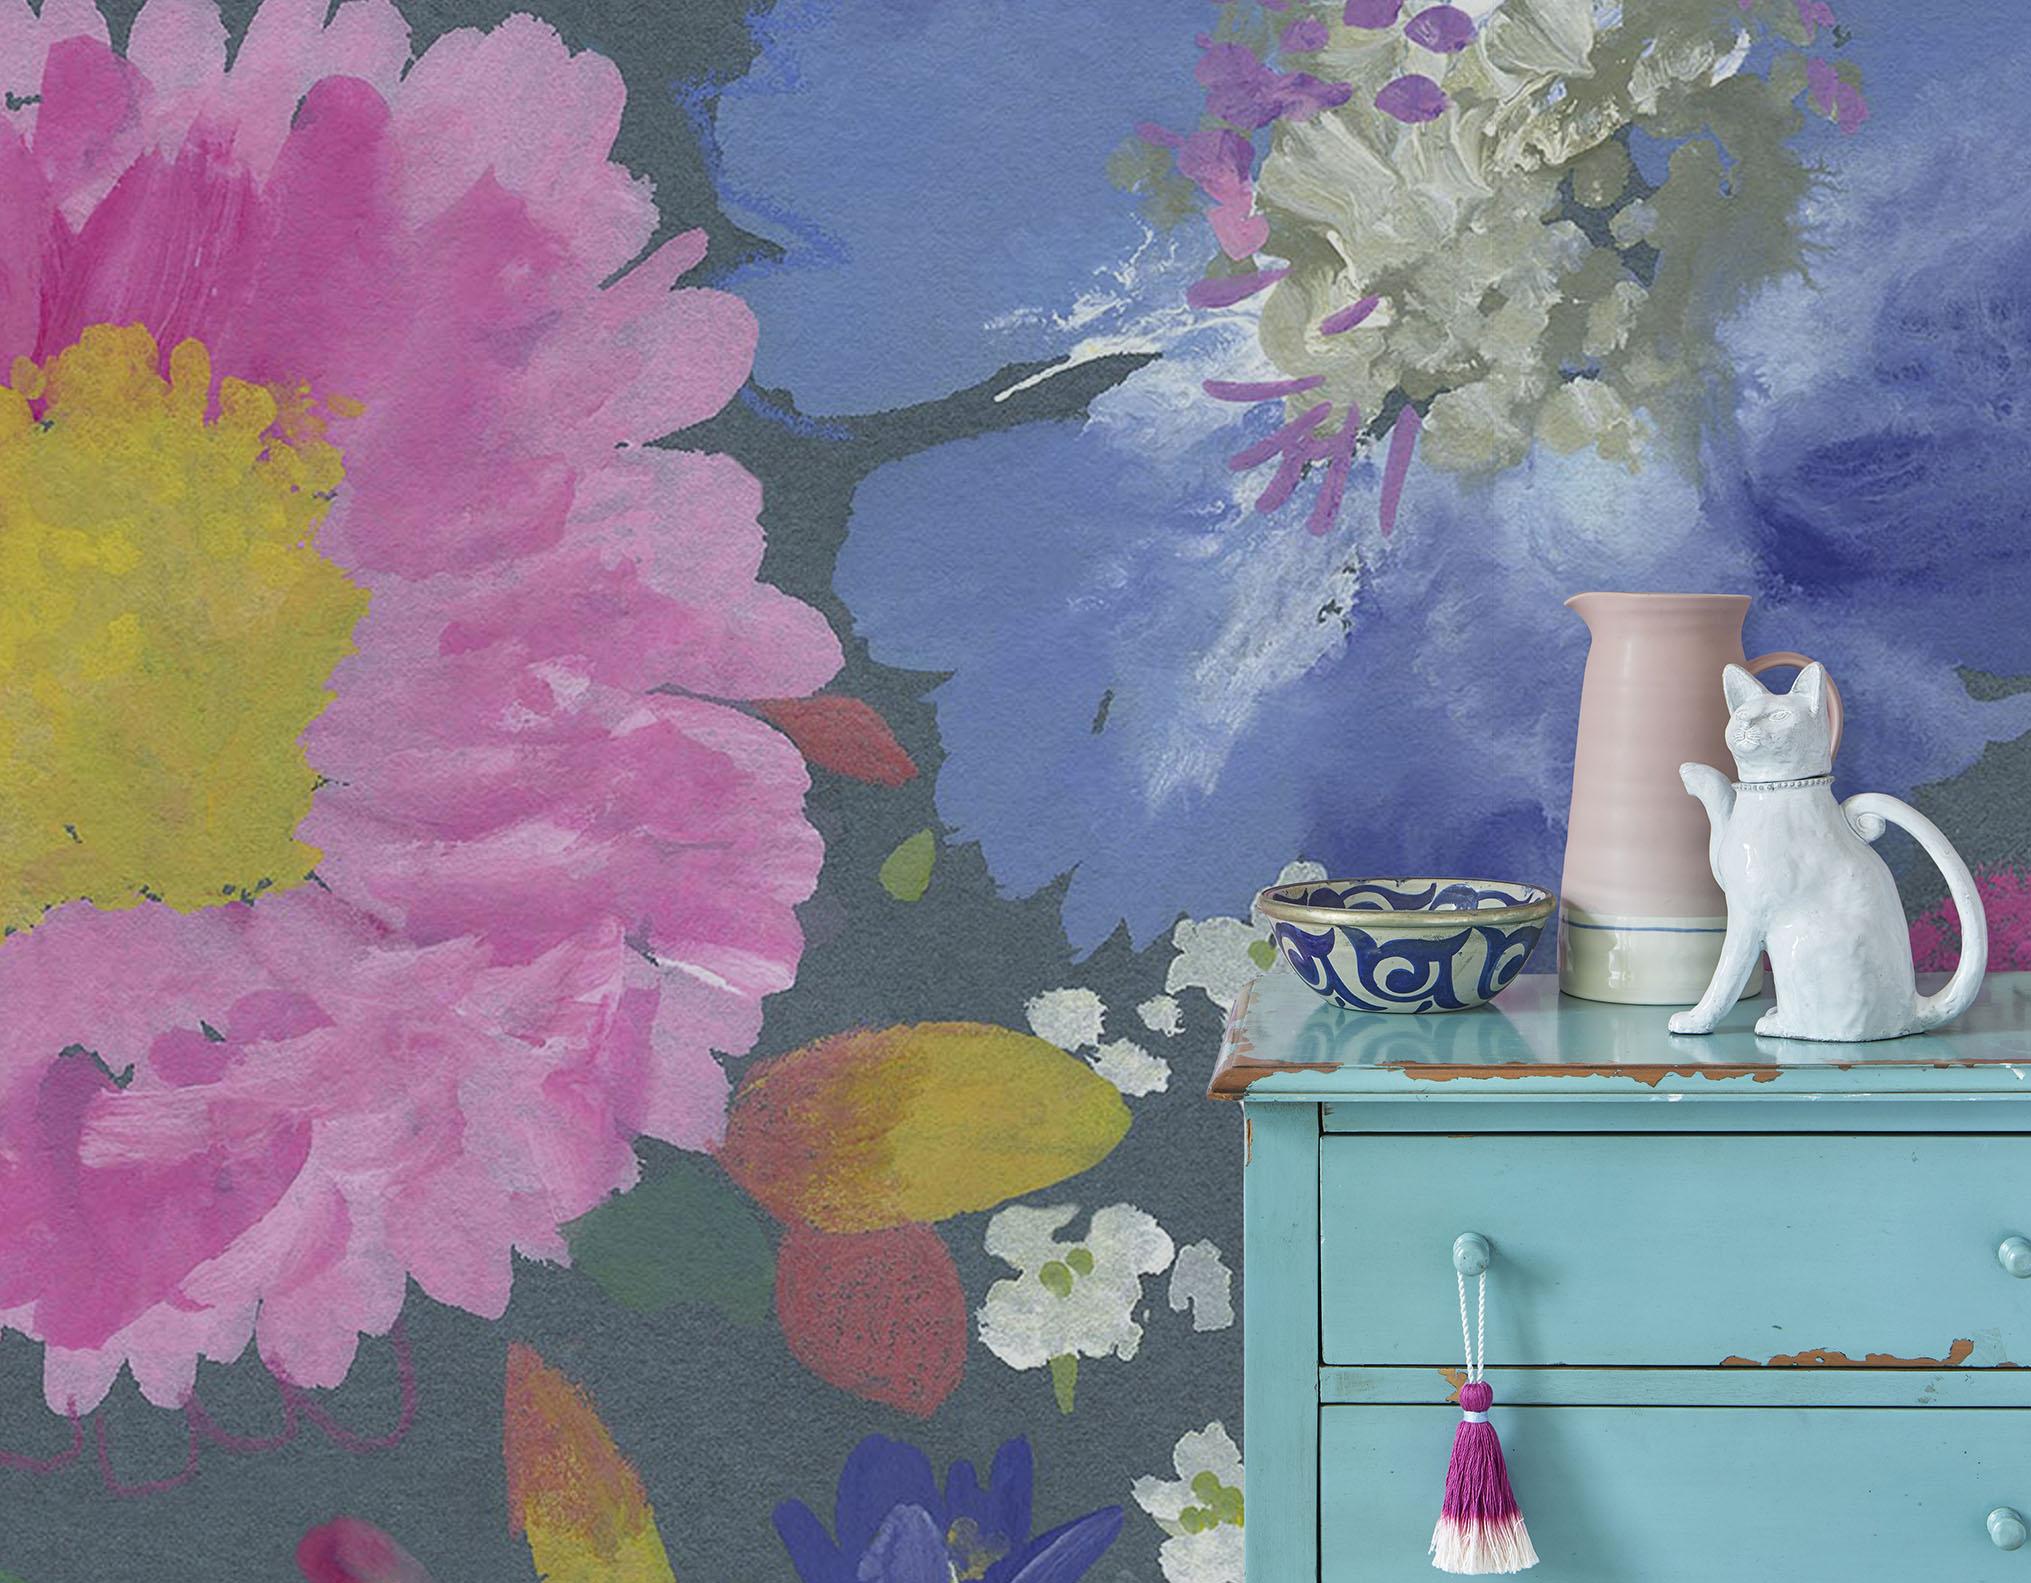 bluebellgray's Kippen smoke wallpaper